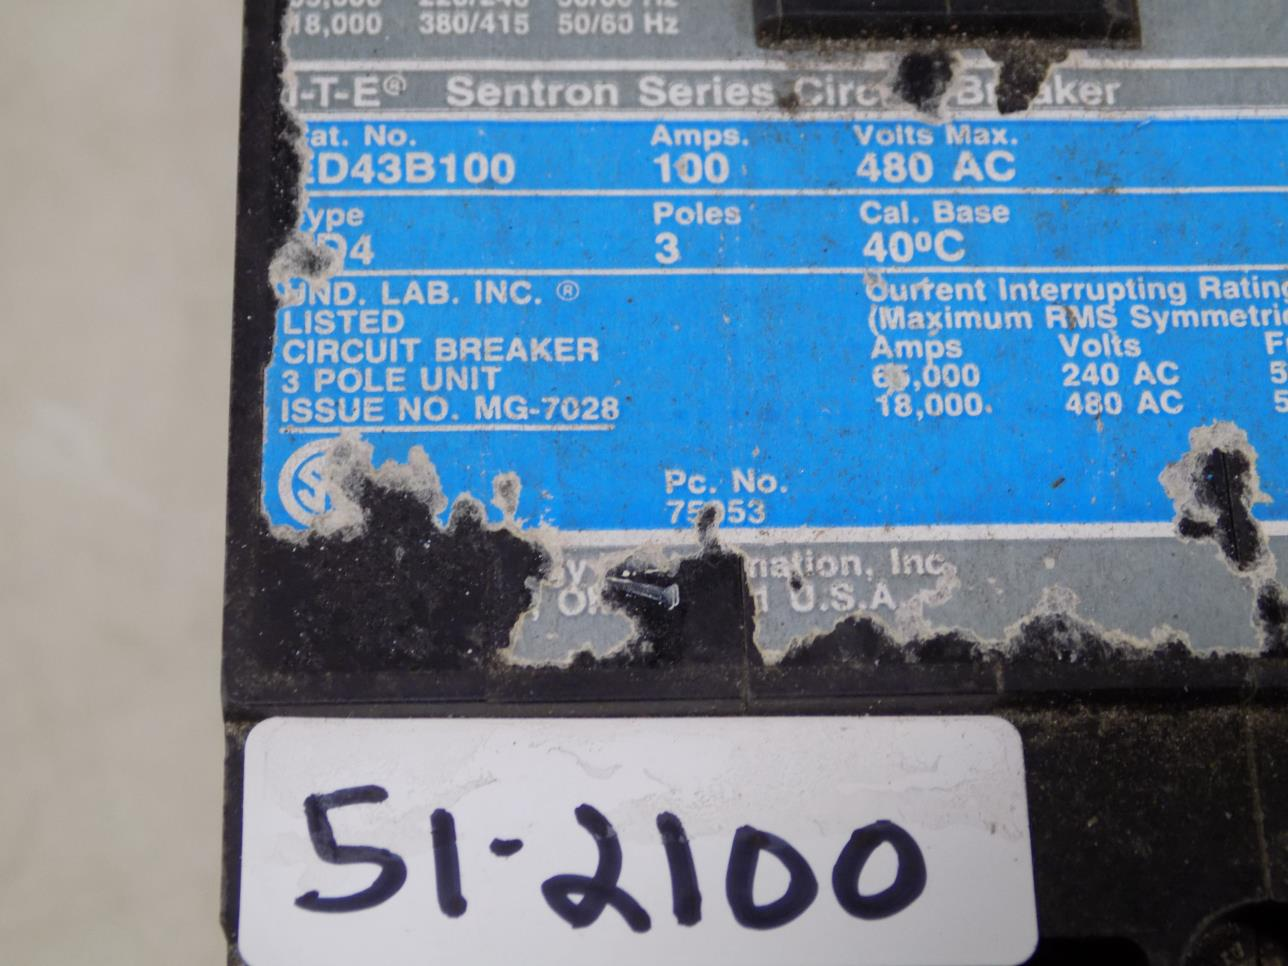 Siemens I T E Sentron Series 100a 480vac 3p Circuit Breaker Ed43b100 Used Breakers Ite E43b060 60 Amp 3 Pole